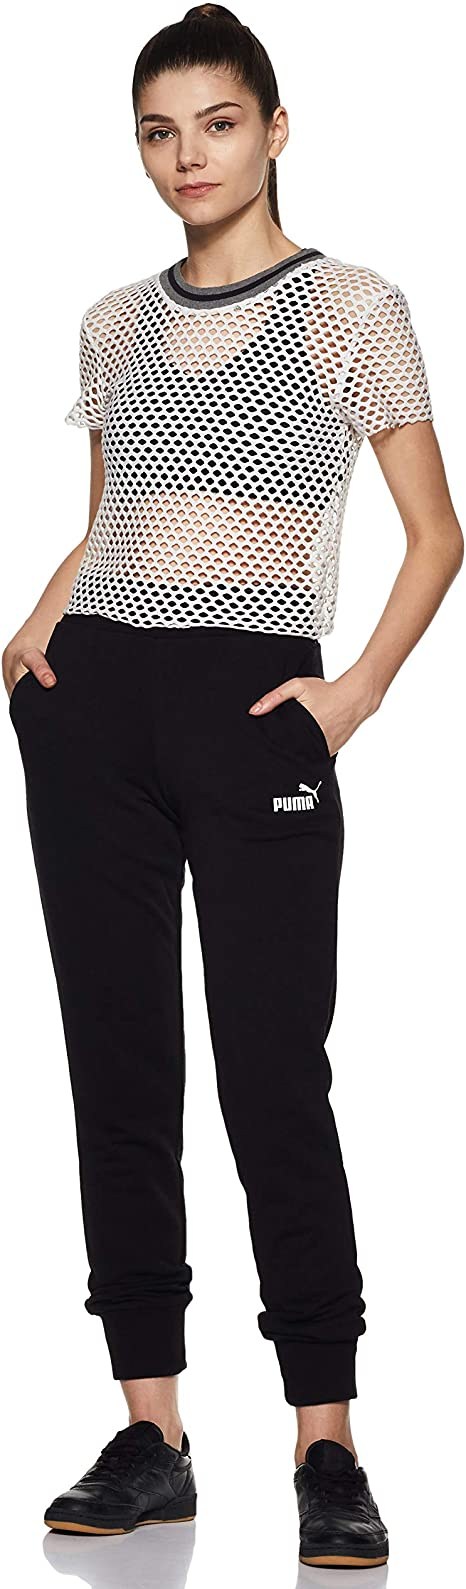 PUMA ESS Sweat TR cl Pants, Mujer, Negro (Cotton Black), XL ...